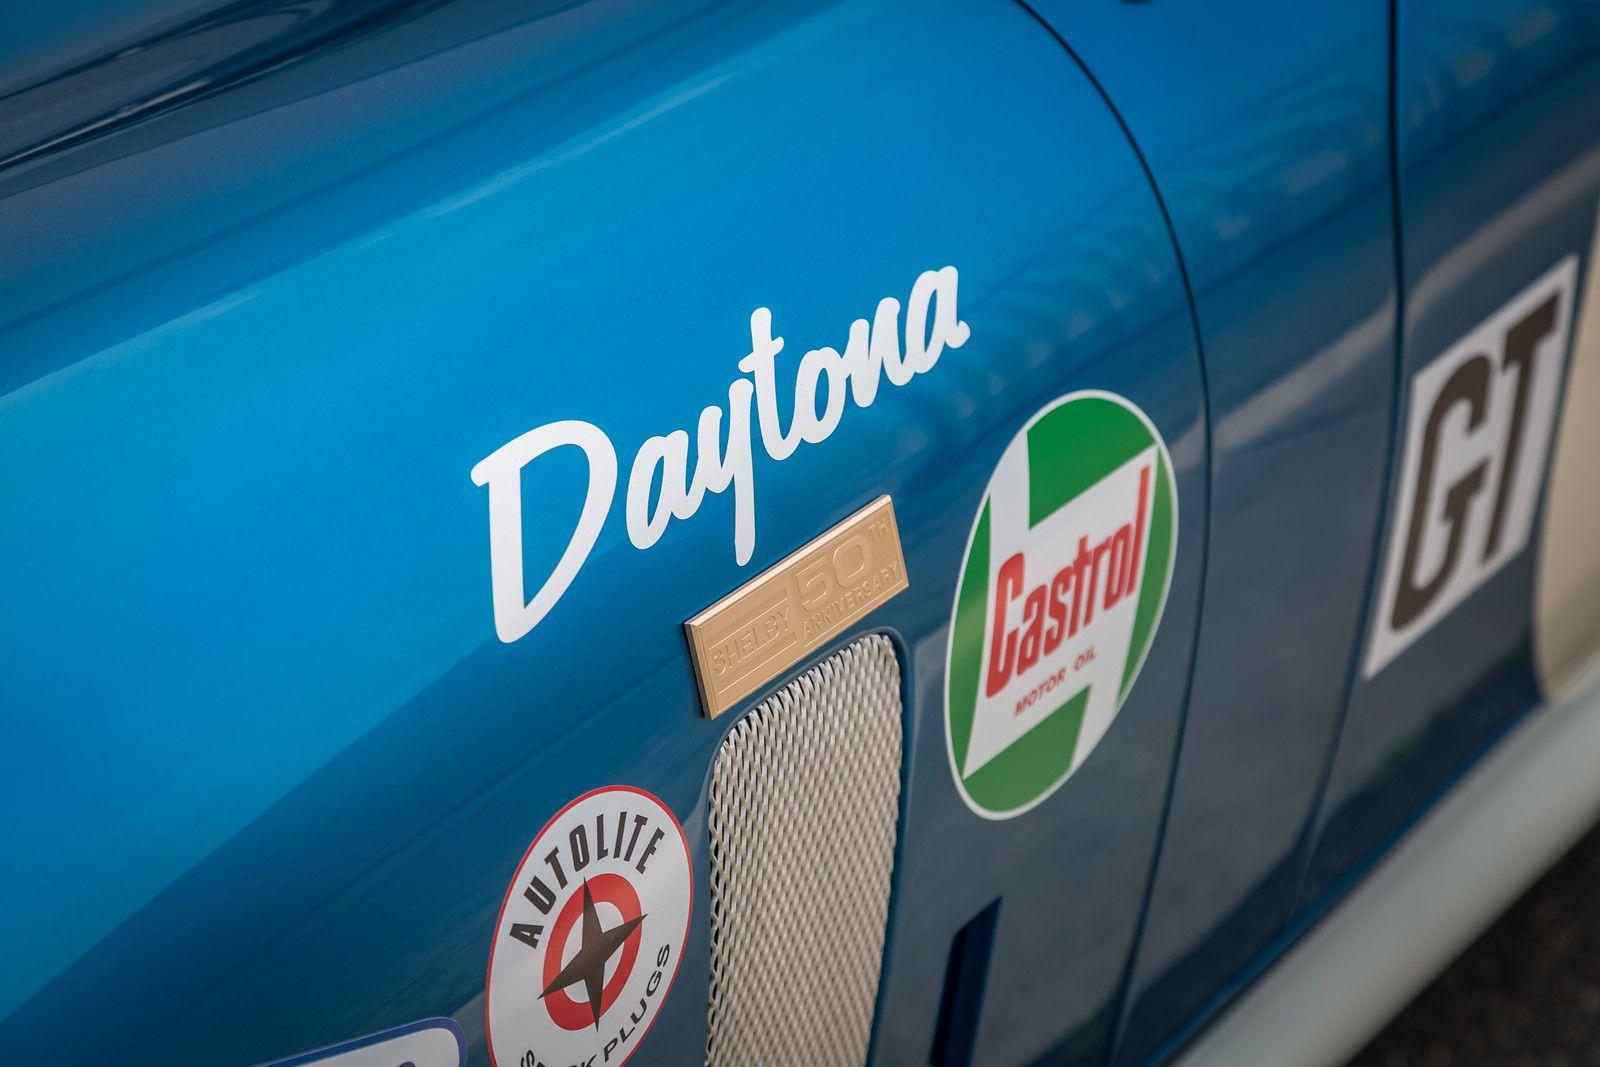 CSX9000 50th Anniversary Daytona Coupe